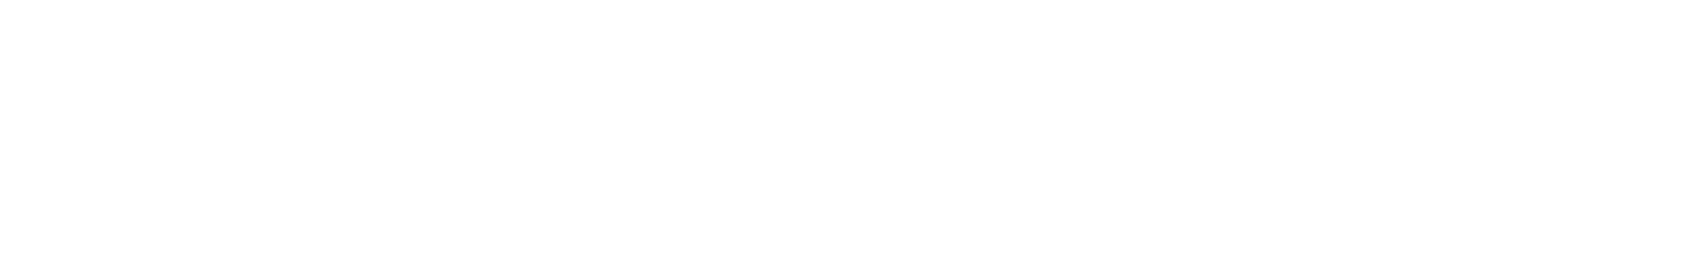 airpurestay-final-white-logo